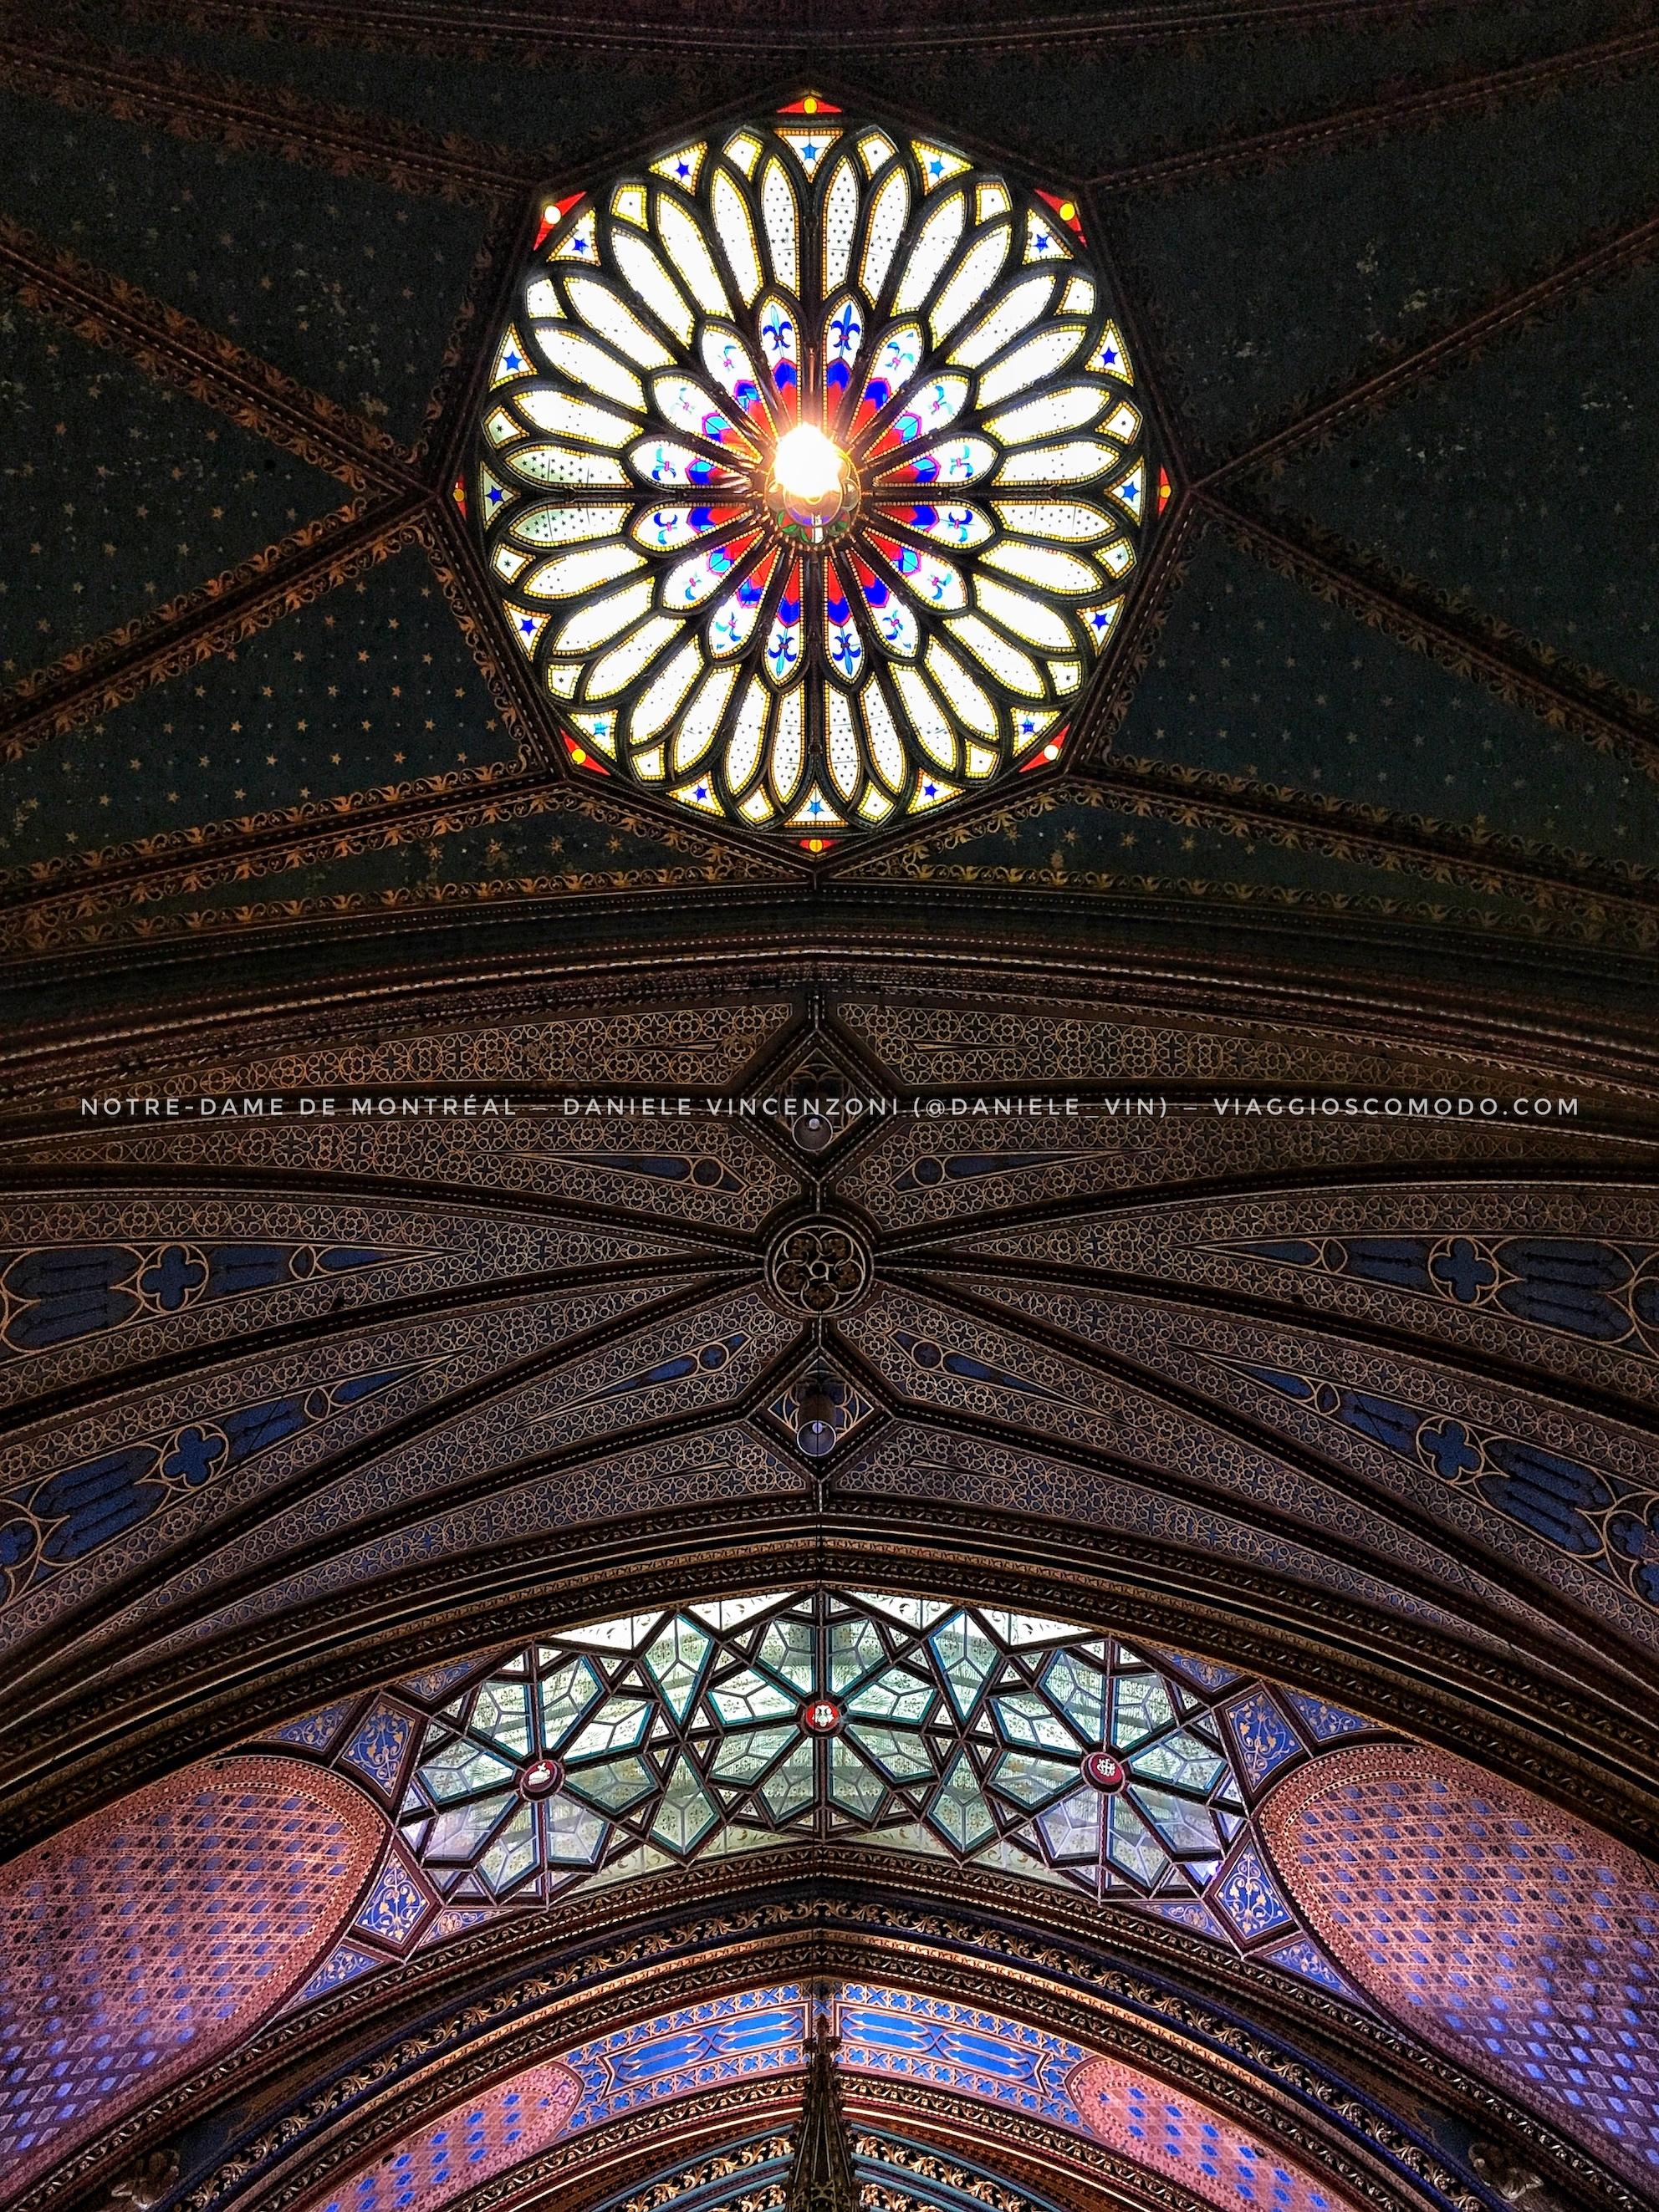 Notre-Dame de Montréal, Canada — Volta